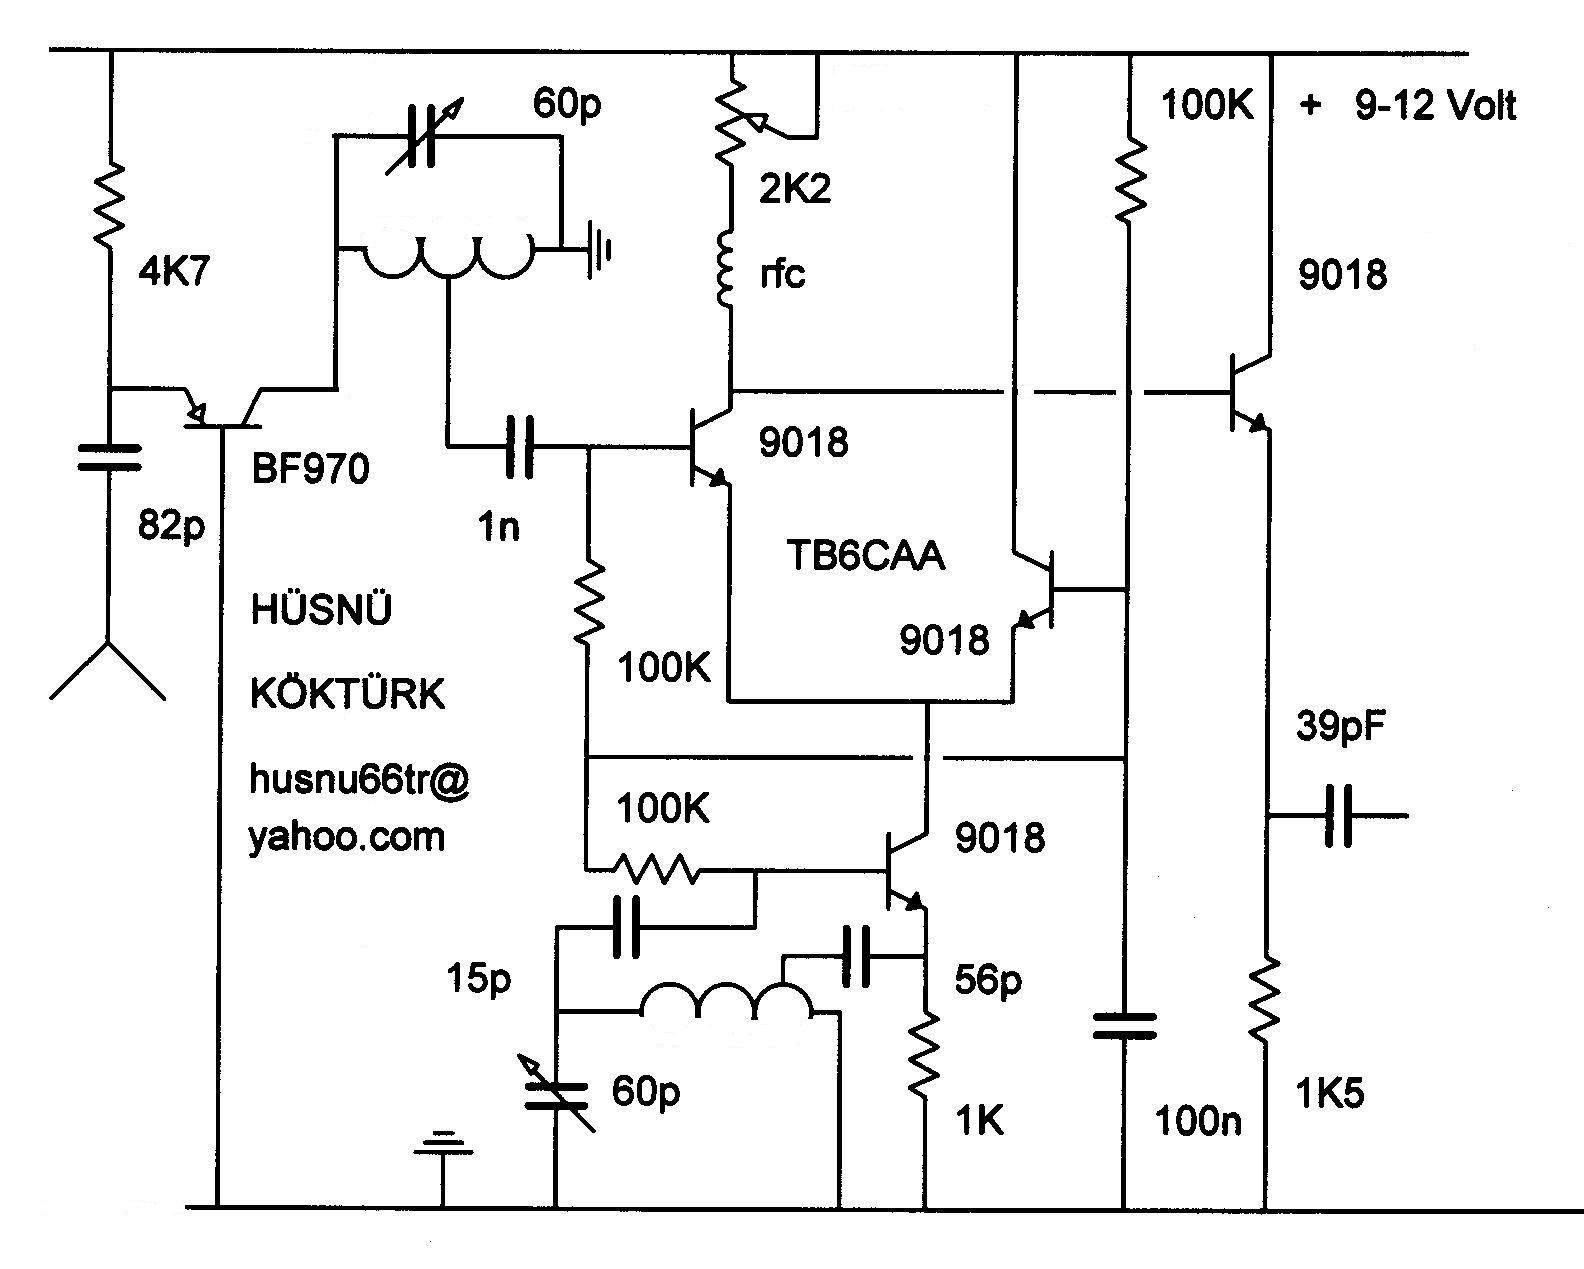 Index Of H U Husnu66tr Figurler Coilless Fm Transmitter Homew Tuner